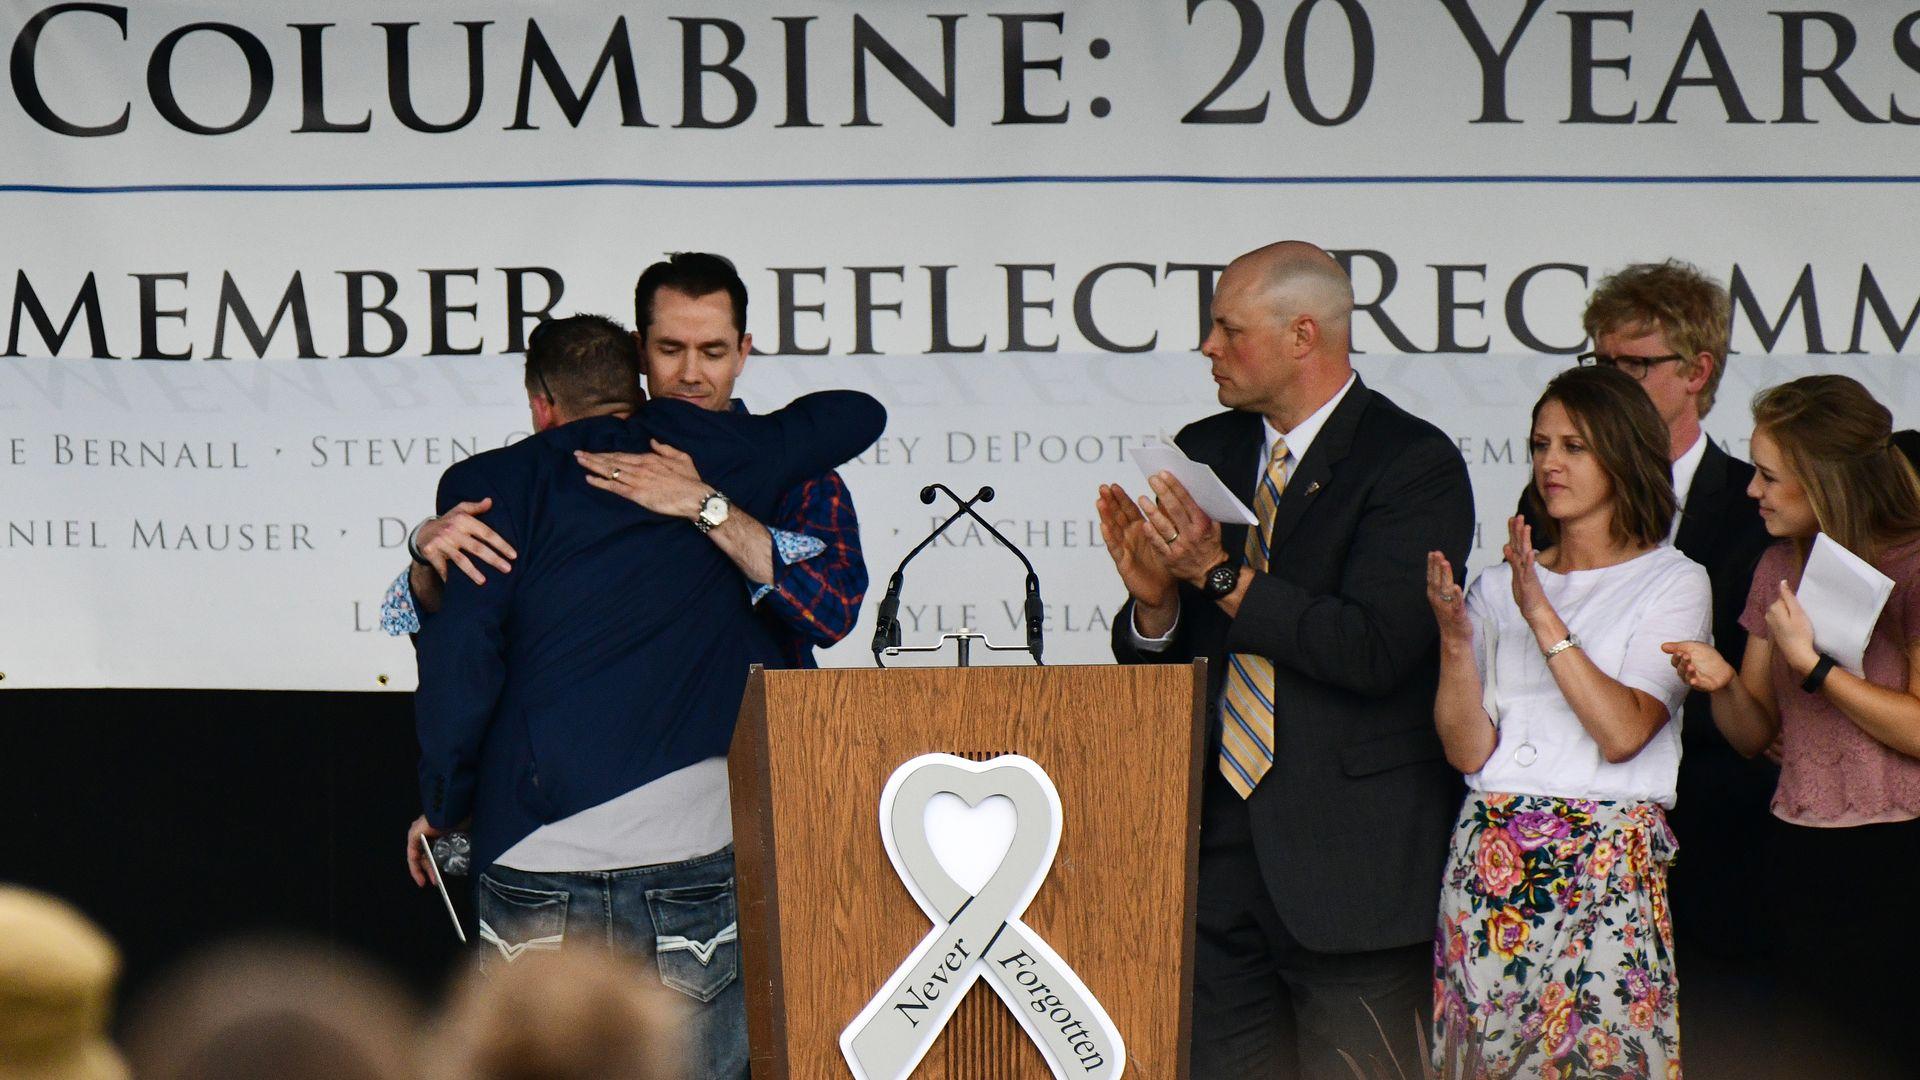 Columbine High School Shooting survivors Sean Graves, left, hugs Patrick Ireland during the Columbine: 20 memorial night.